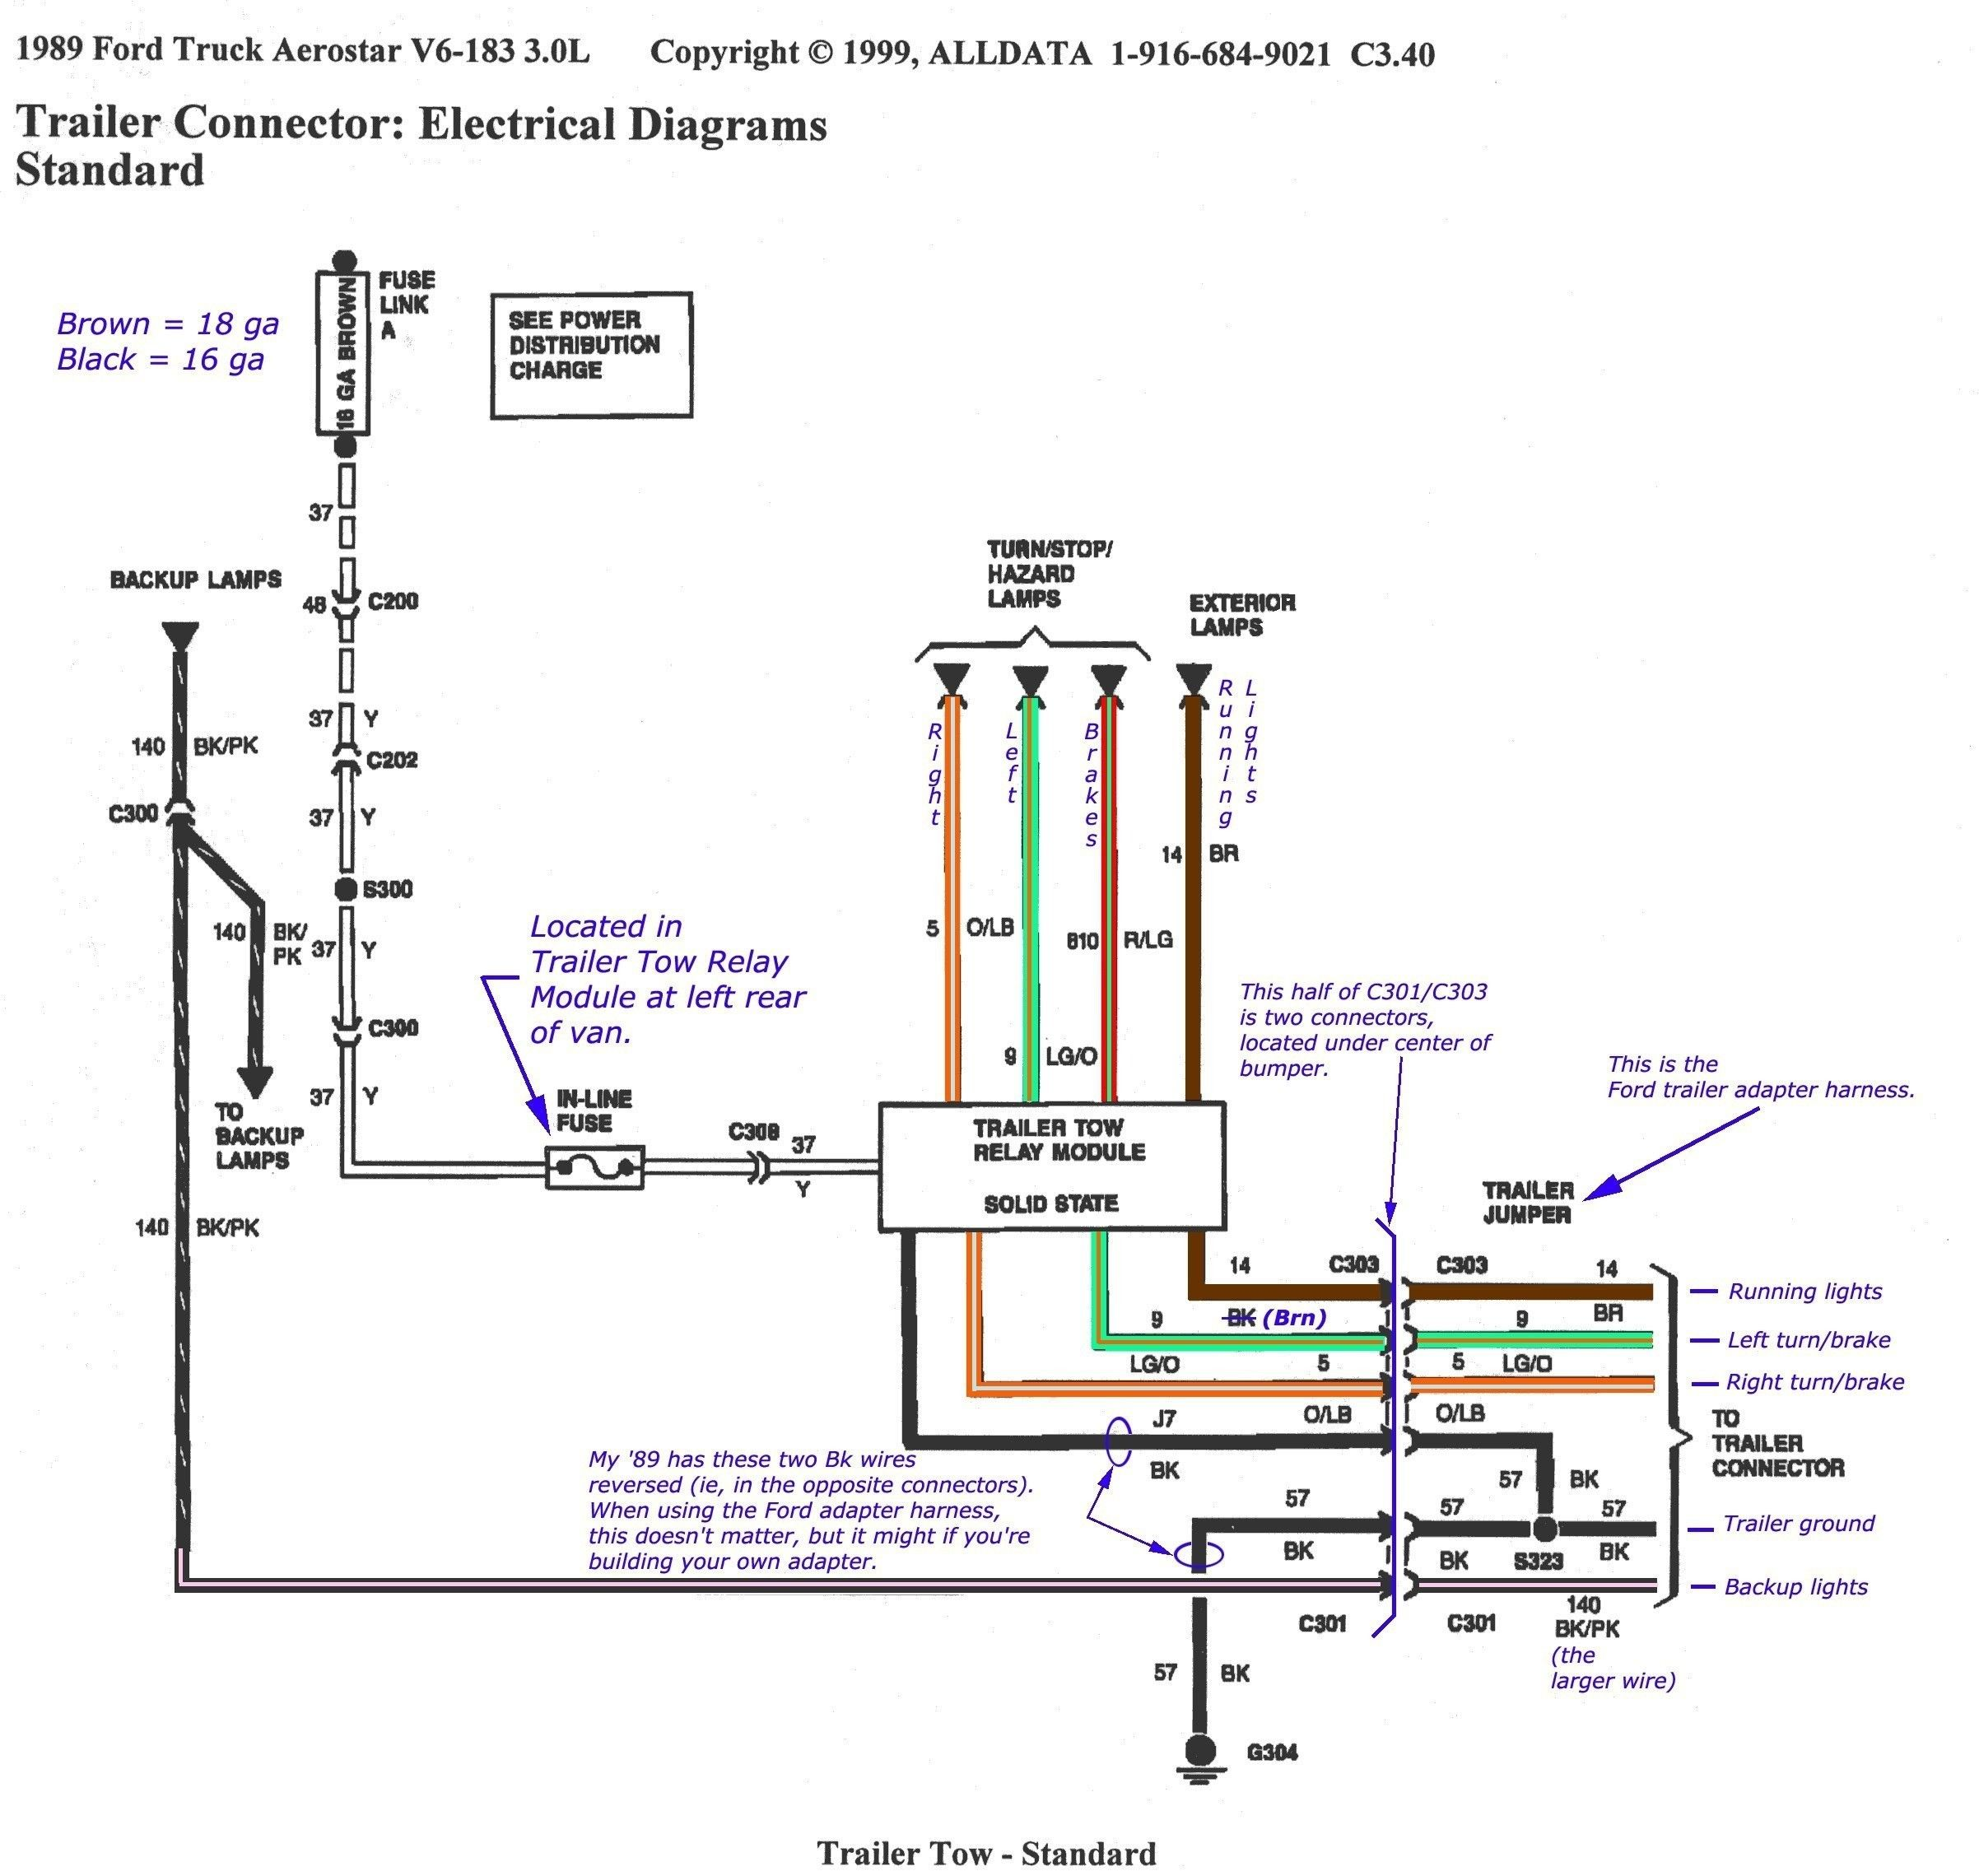 Dodge Ram 1500 Wiring Diagram In 2020 Trailer Wiring Diagram Trailer Light Wiring Electrical Wiring Diagram